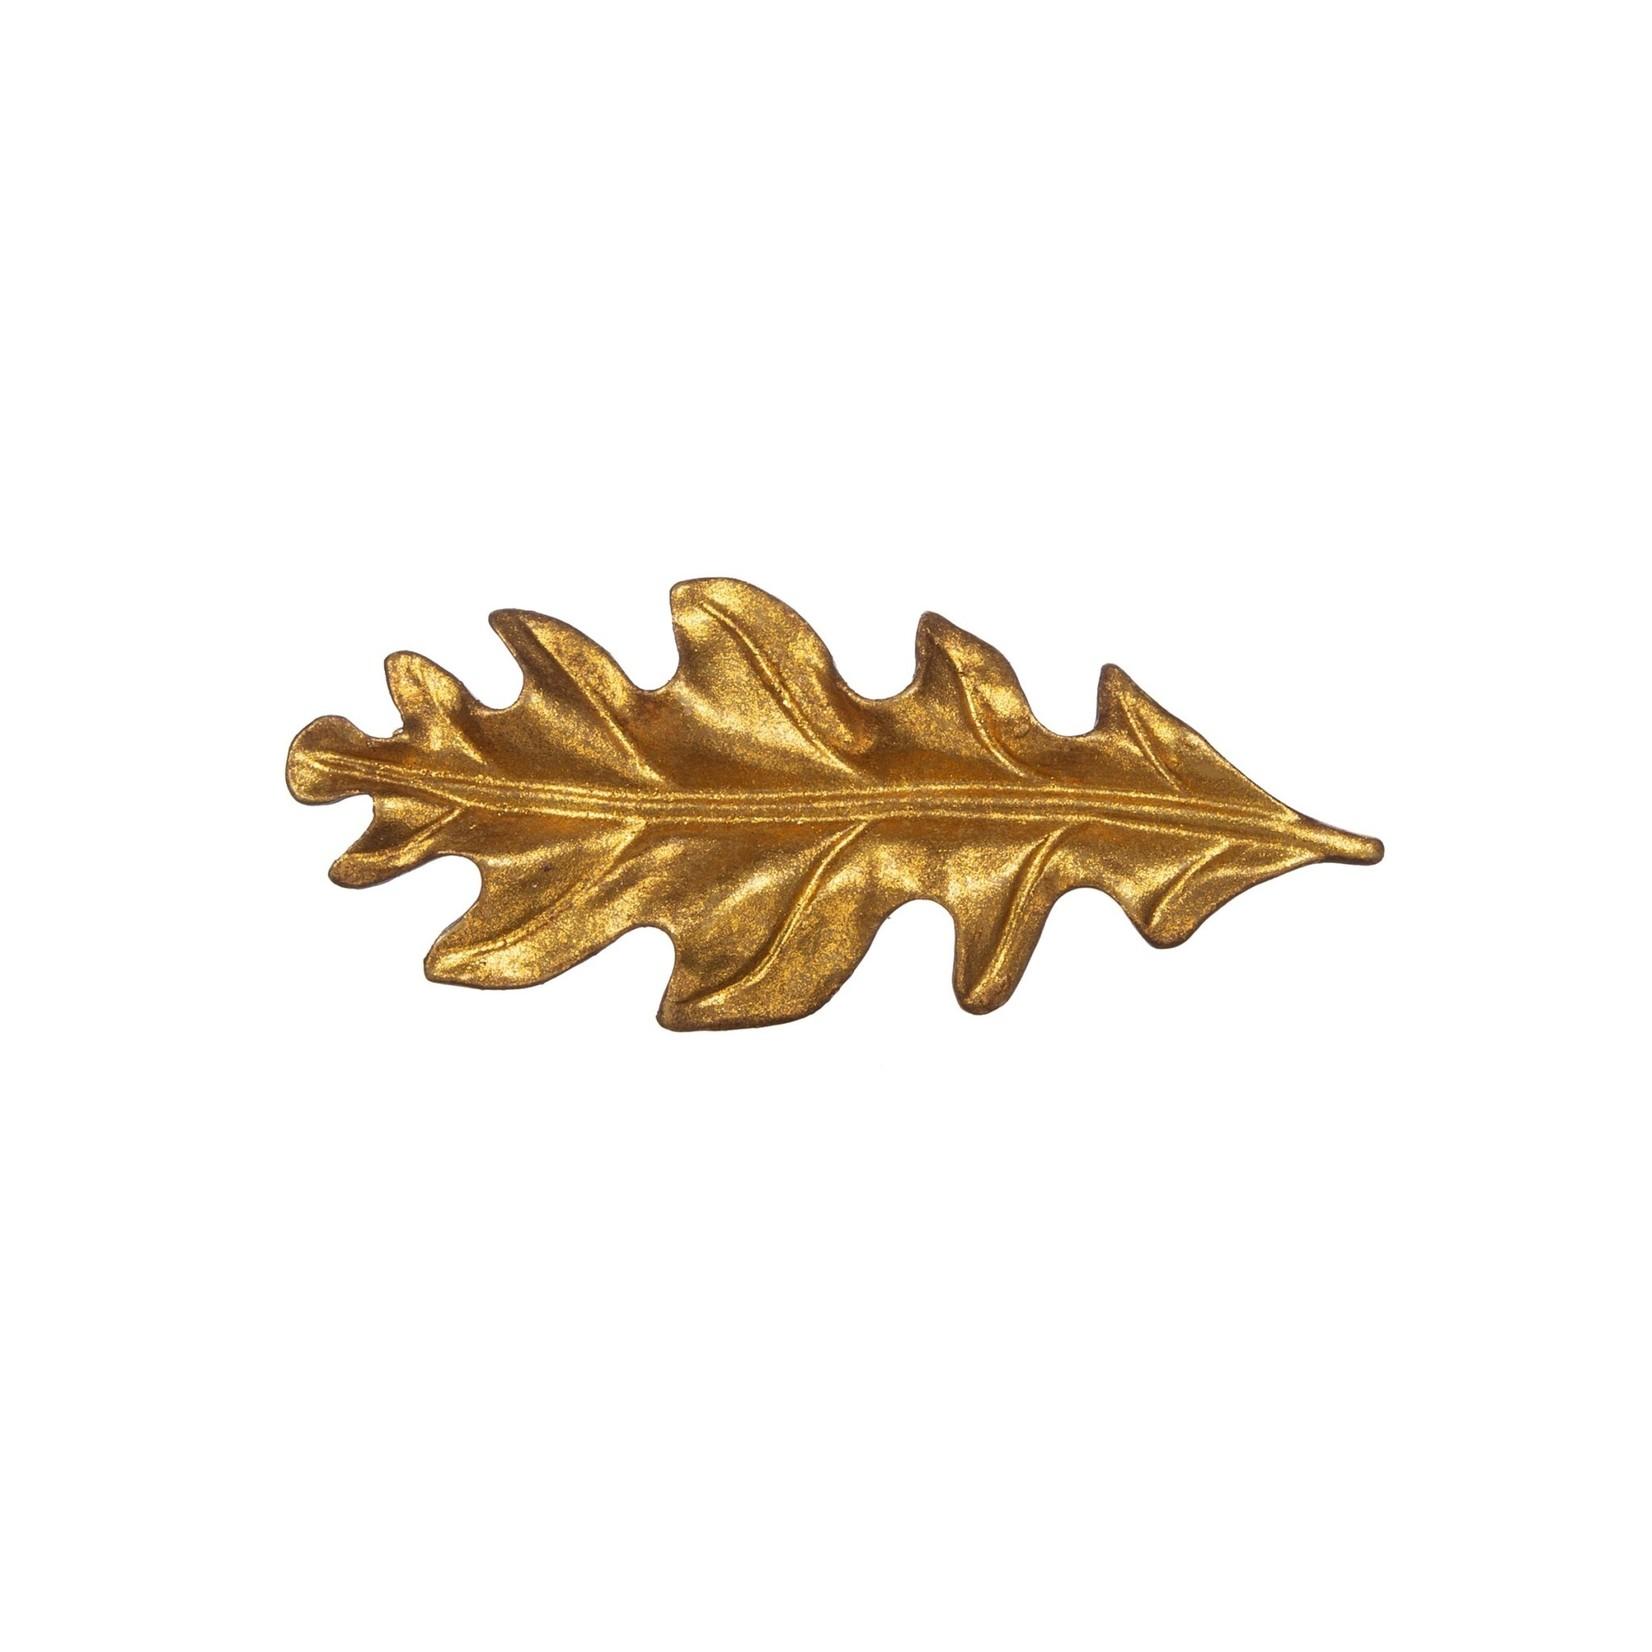 Sass and Belle Gold Leaf Drawer Knob